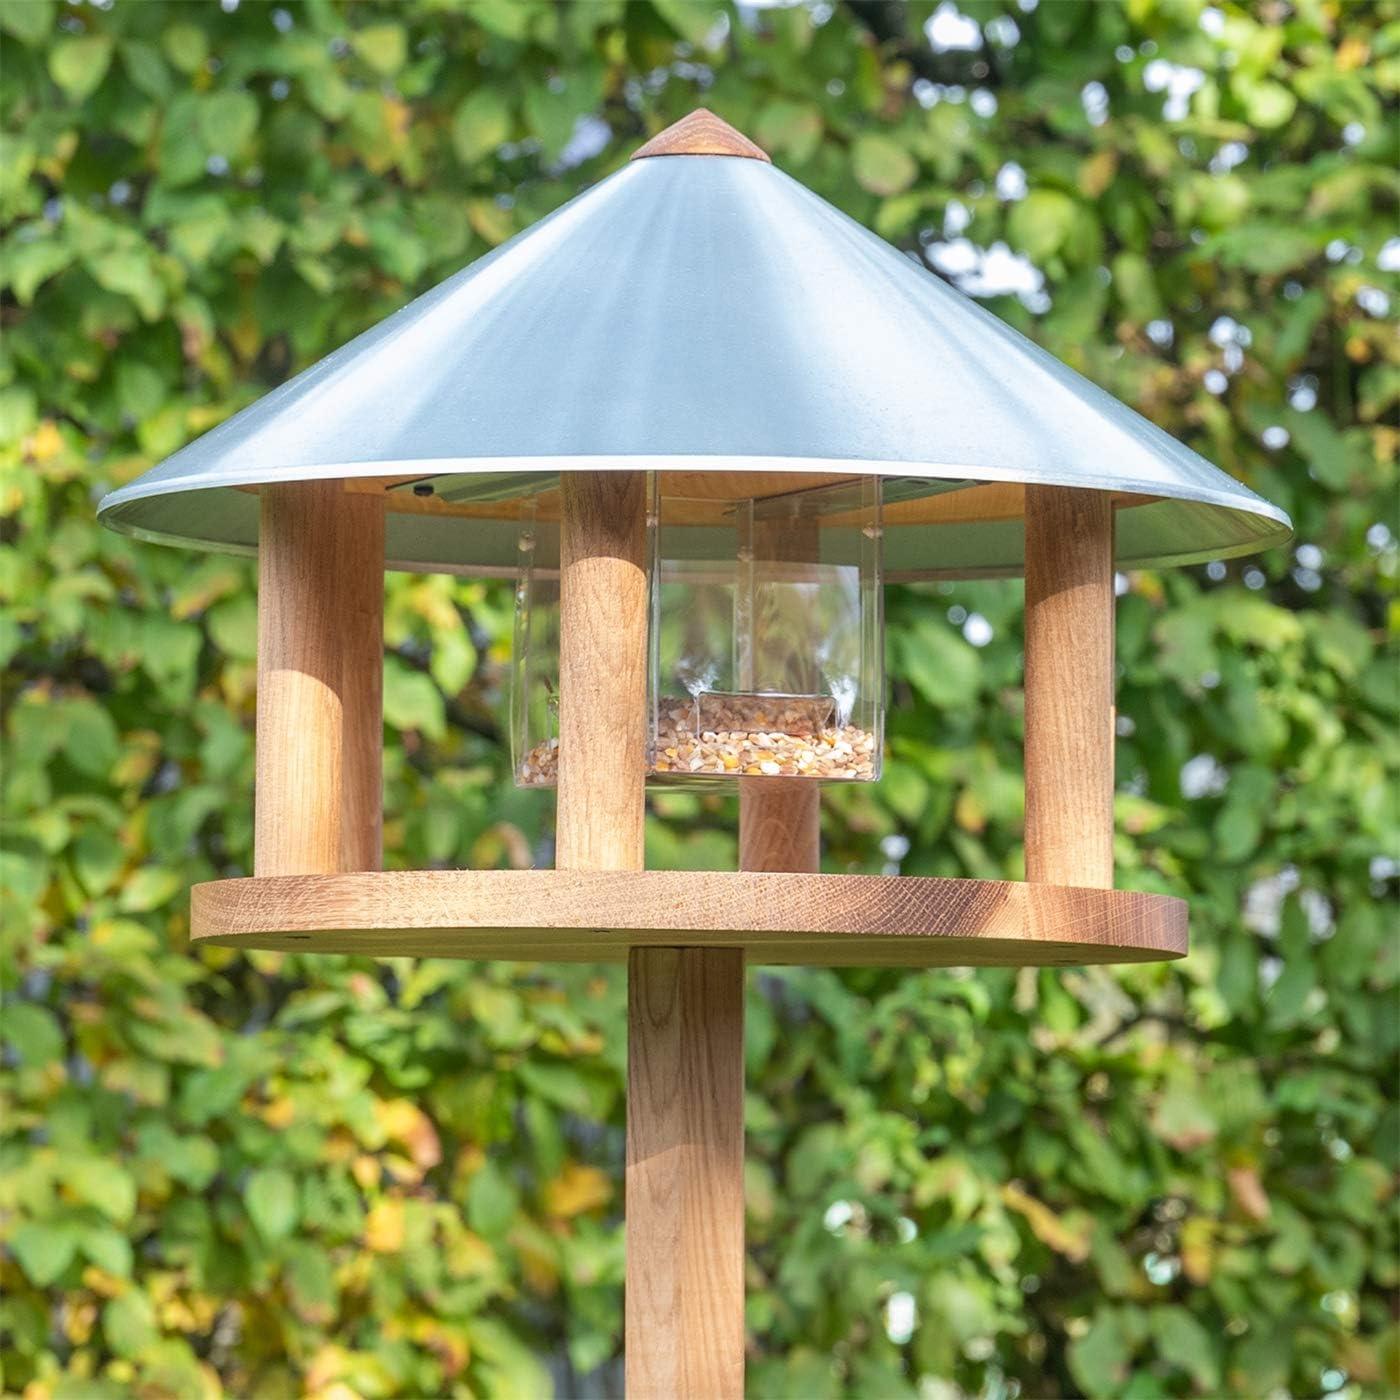 Bird Feeder Birdhouse Feeding Station Voss.garden Aarhus Wooden Bird Table